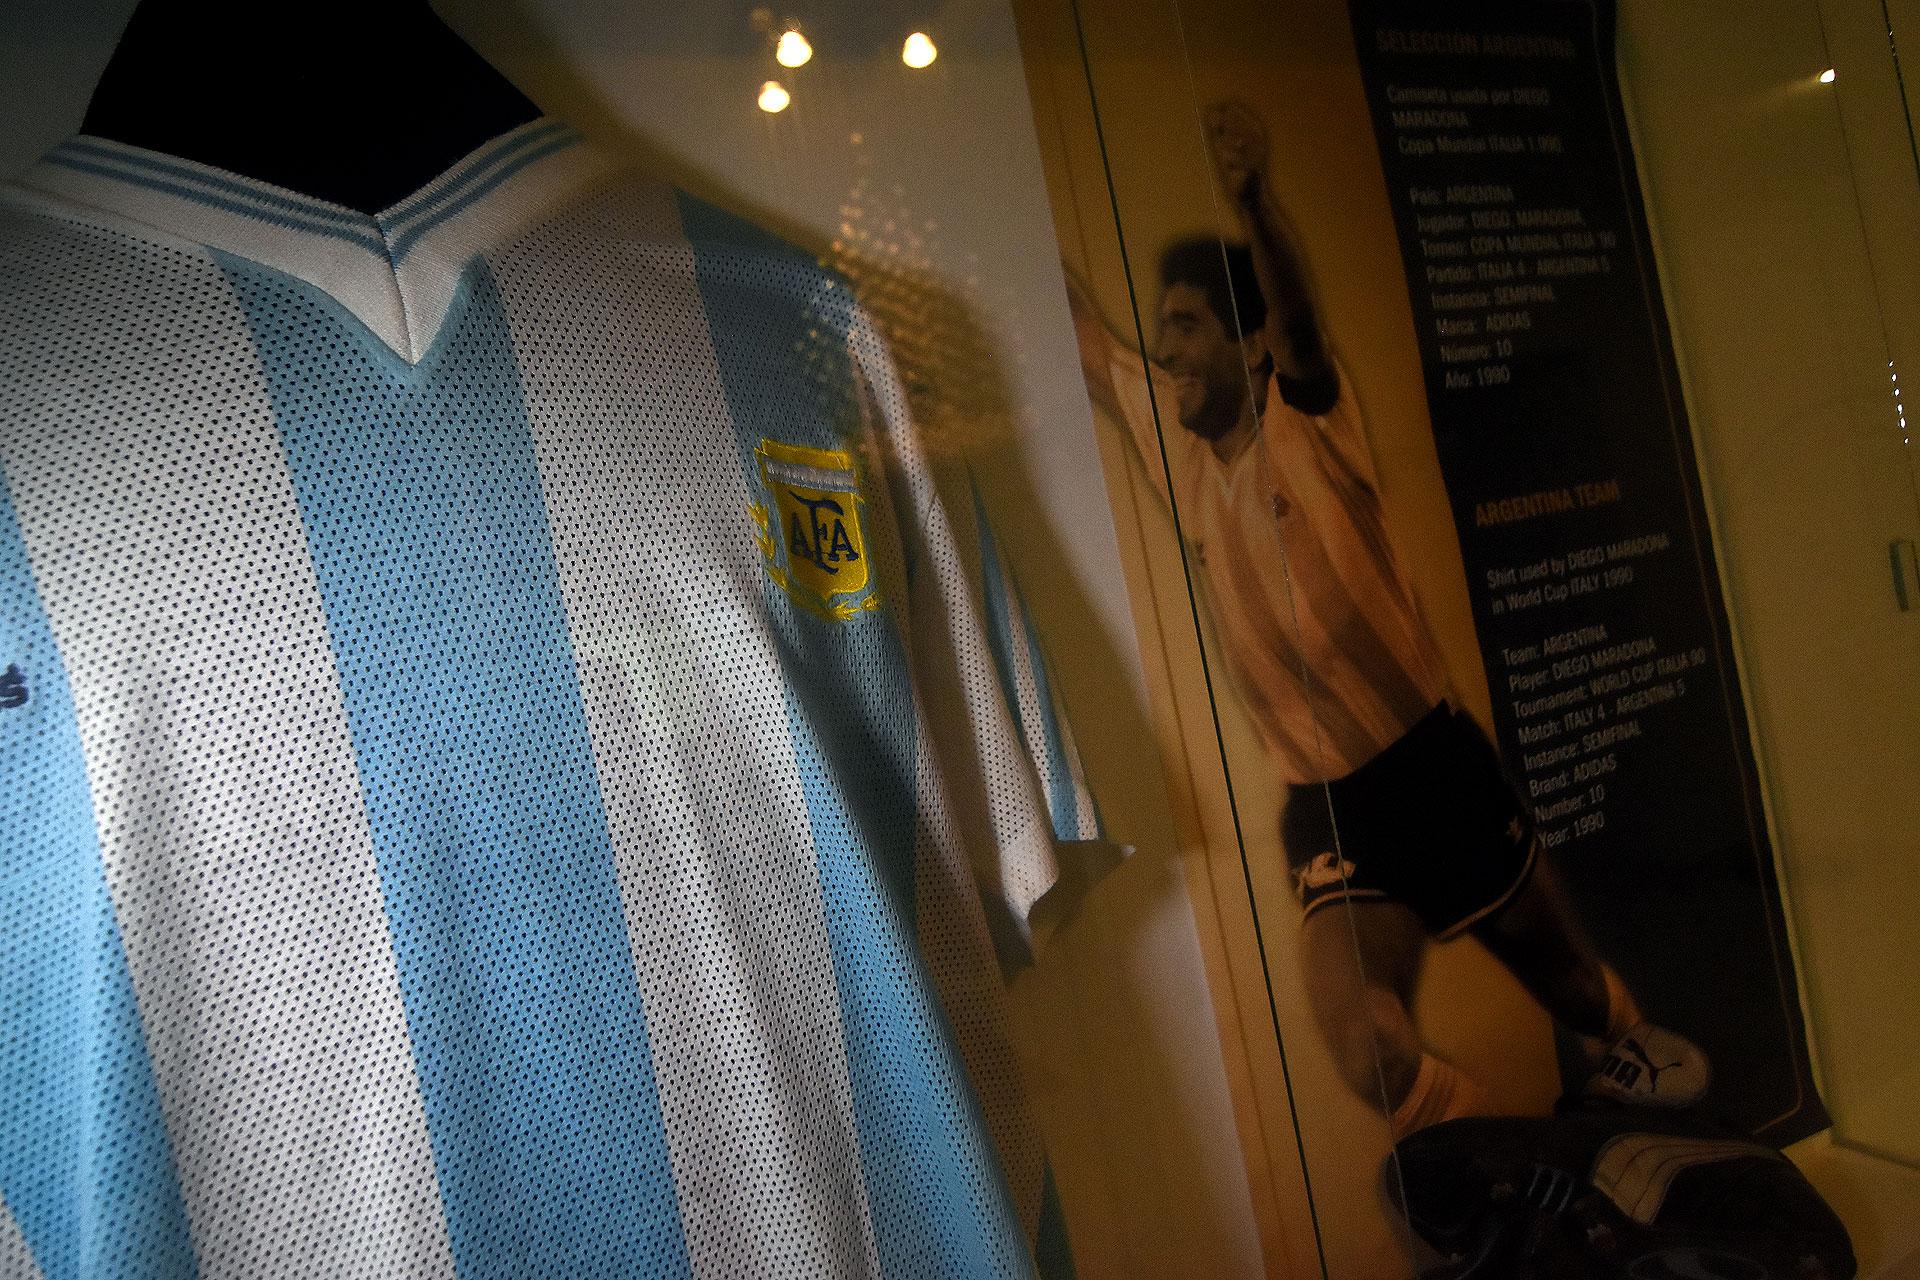 Camiseta y botines Puma de Diego Armando Maradona en el Mundial de Italia 90 (Nicolas Stulberg) (Nicolas Stulberg)